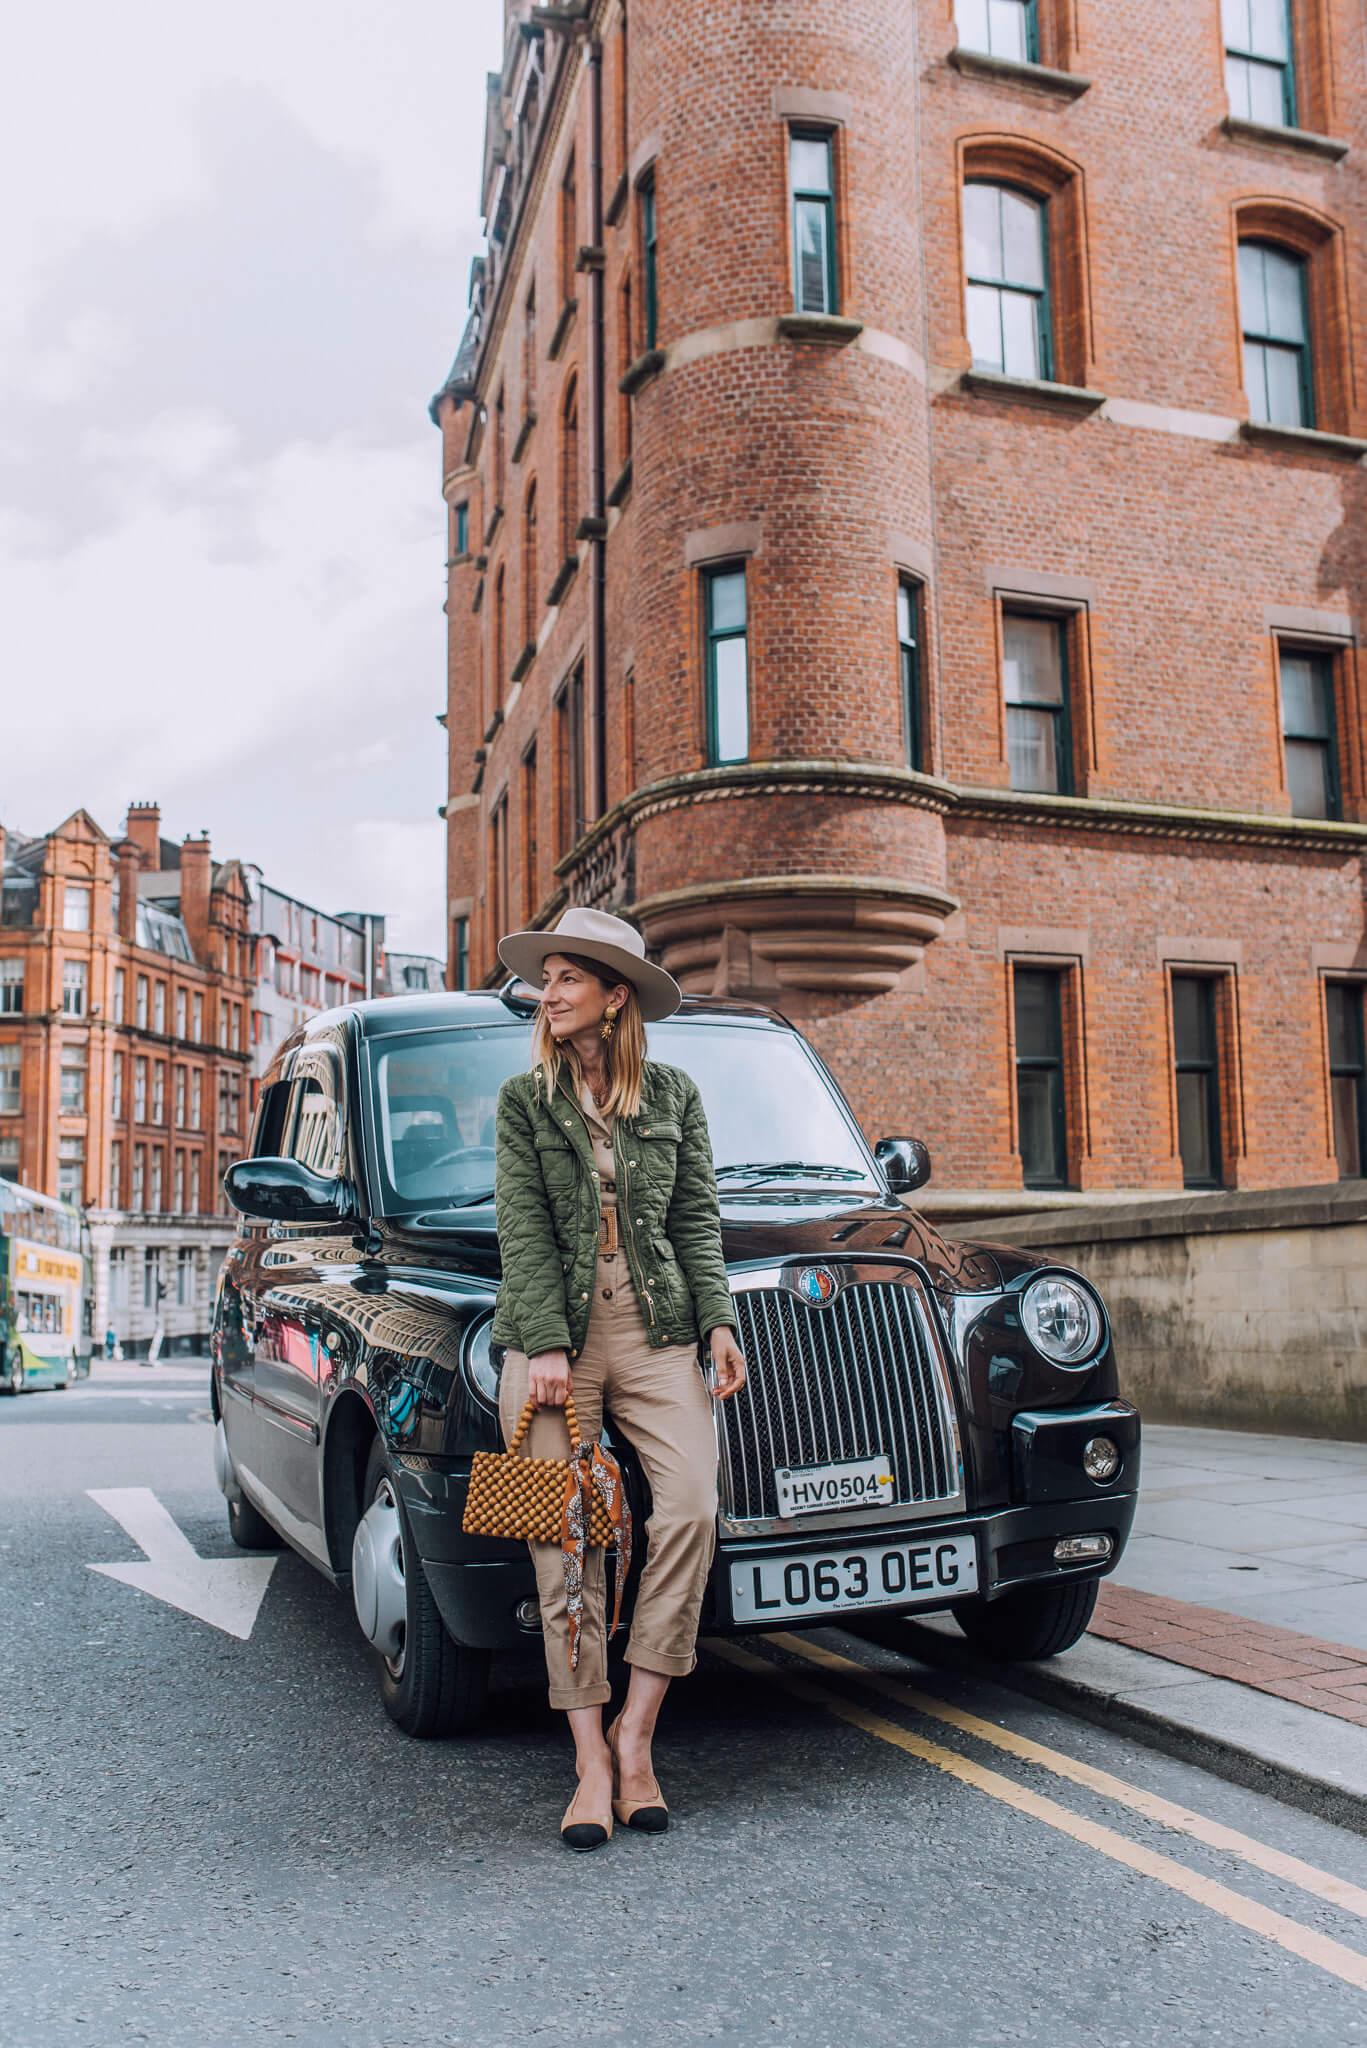 manchester black taxi tour